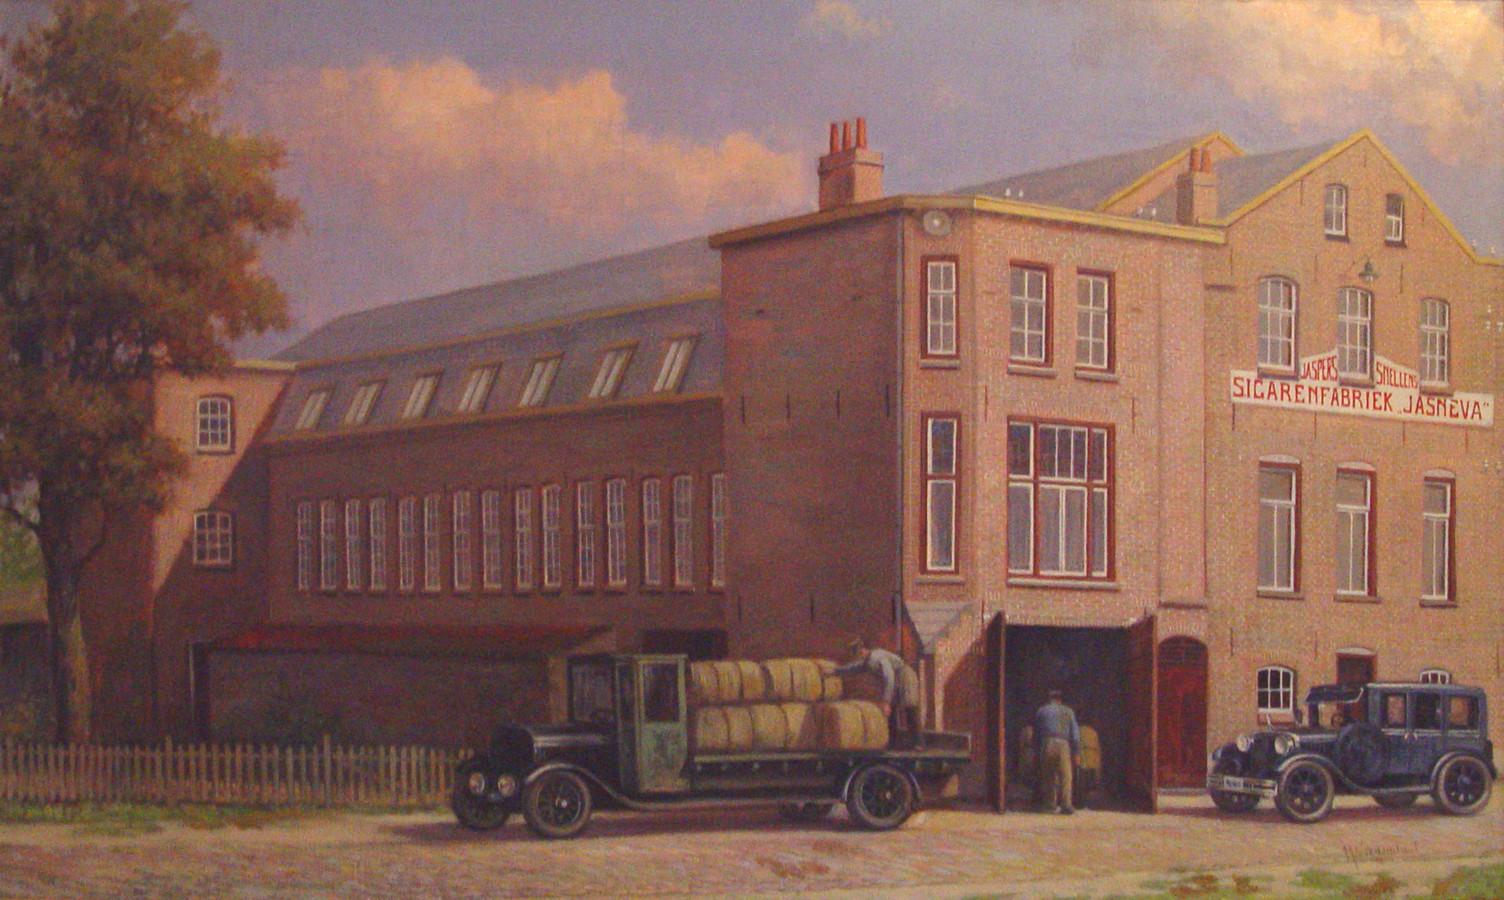 Jasneva (van firma Jaspers-Snellens-Valkenswaard) sigarenfabriek in Valkenswaard.